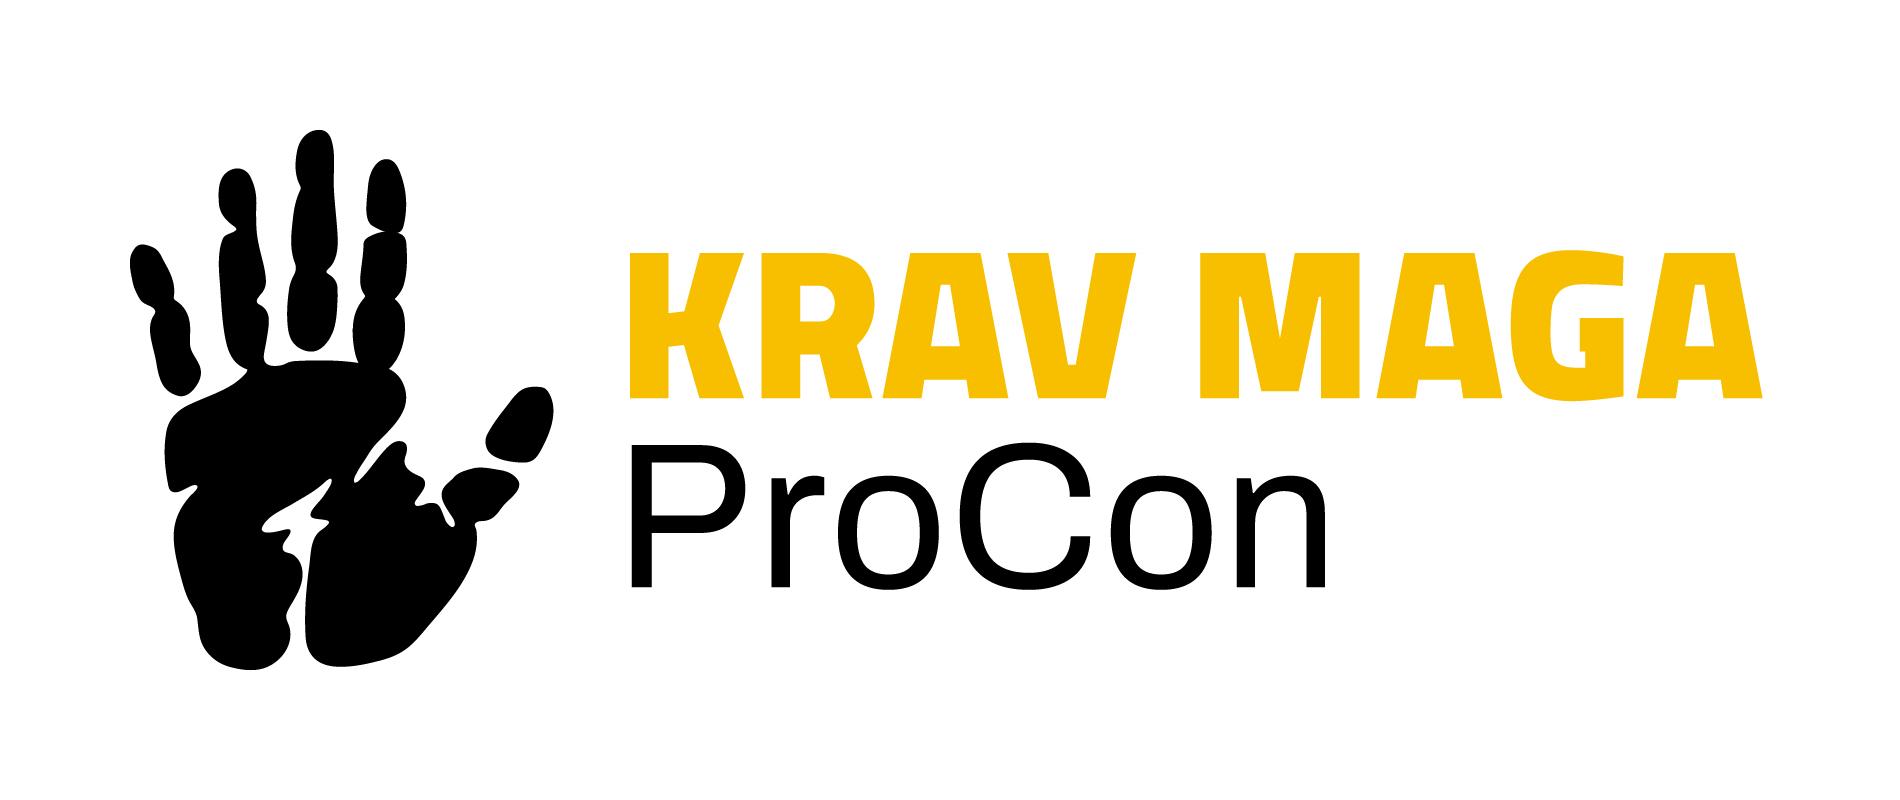 Marke2_kravmaga_procon_logo_pos_2_R